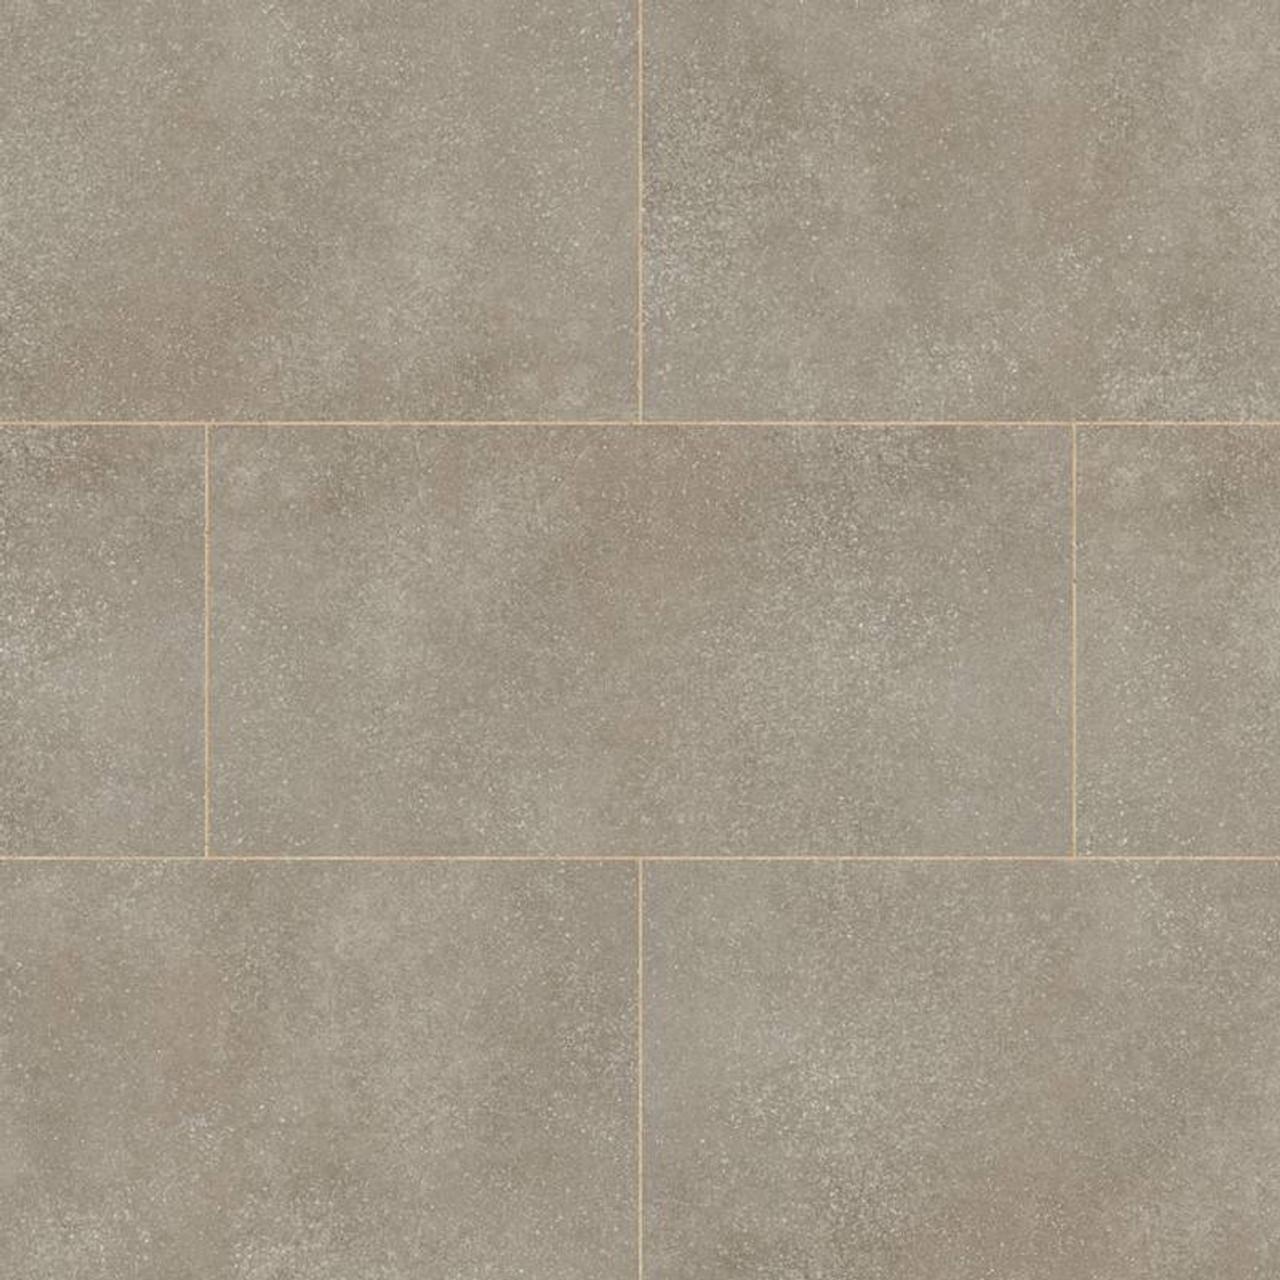 karndean opus stone 18 x 36 luxury vinyl tile